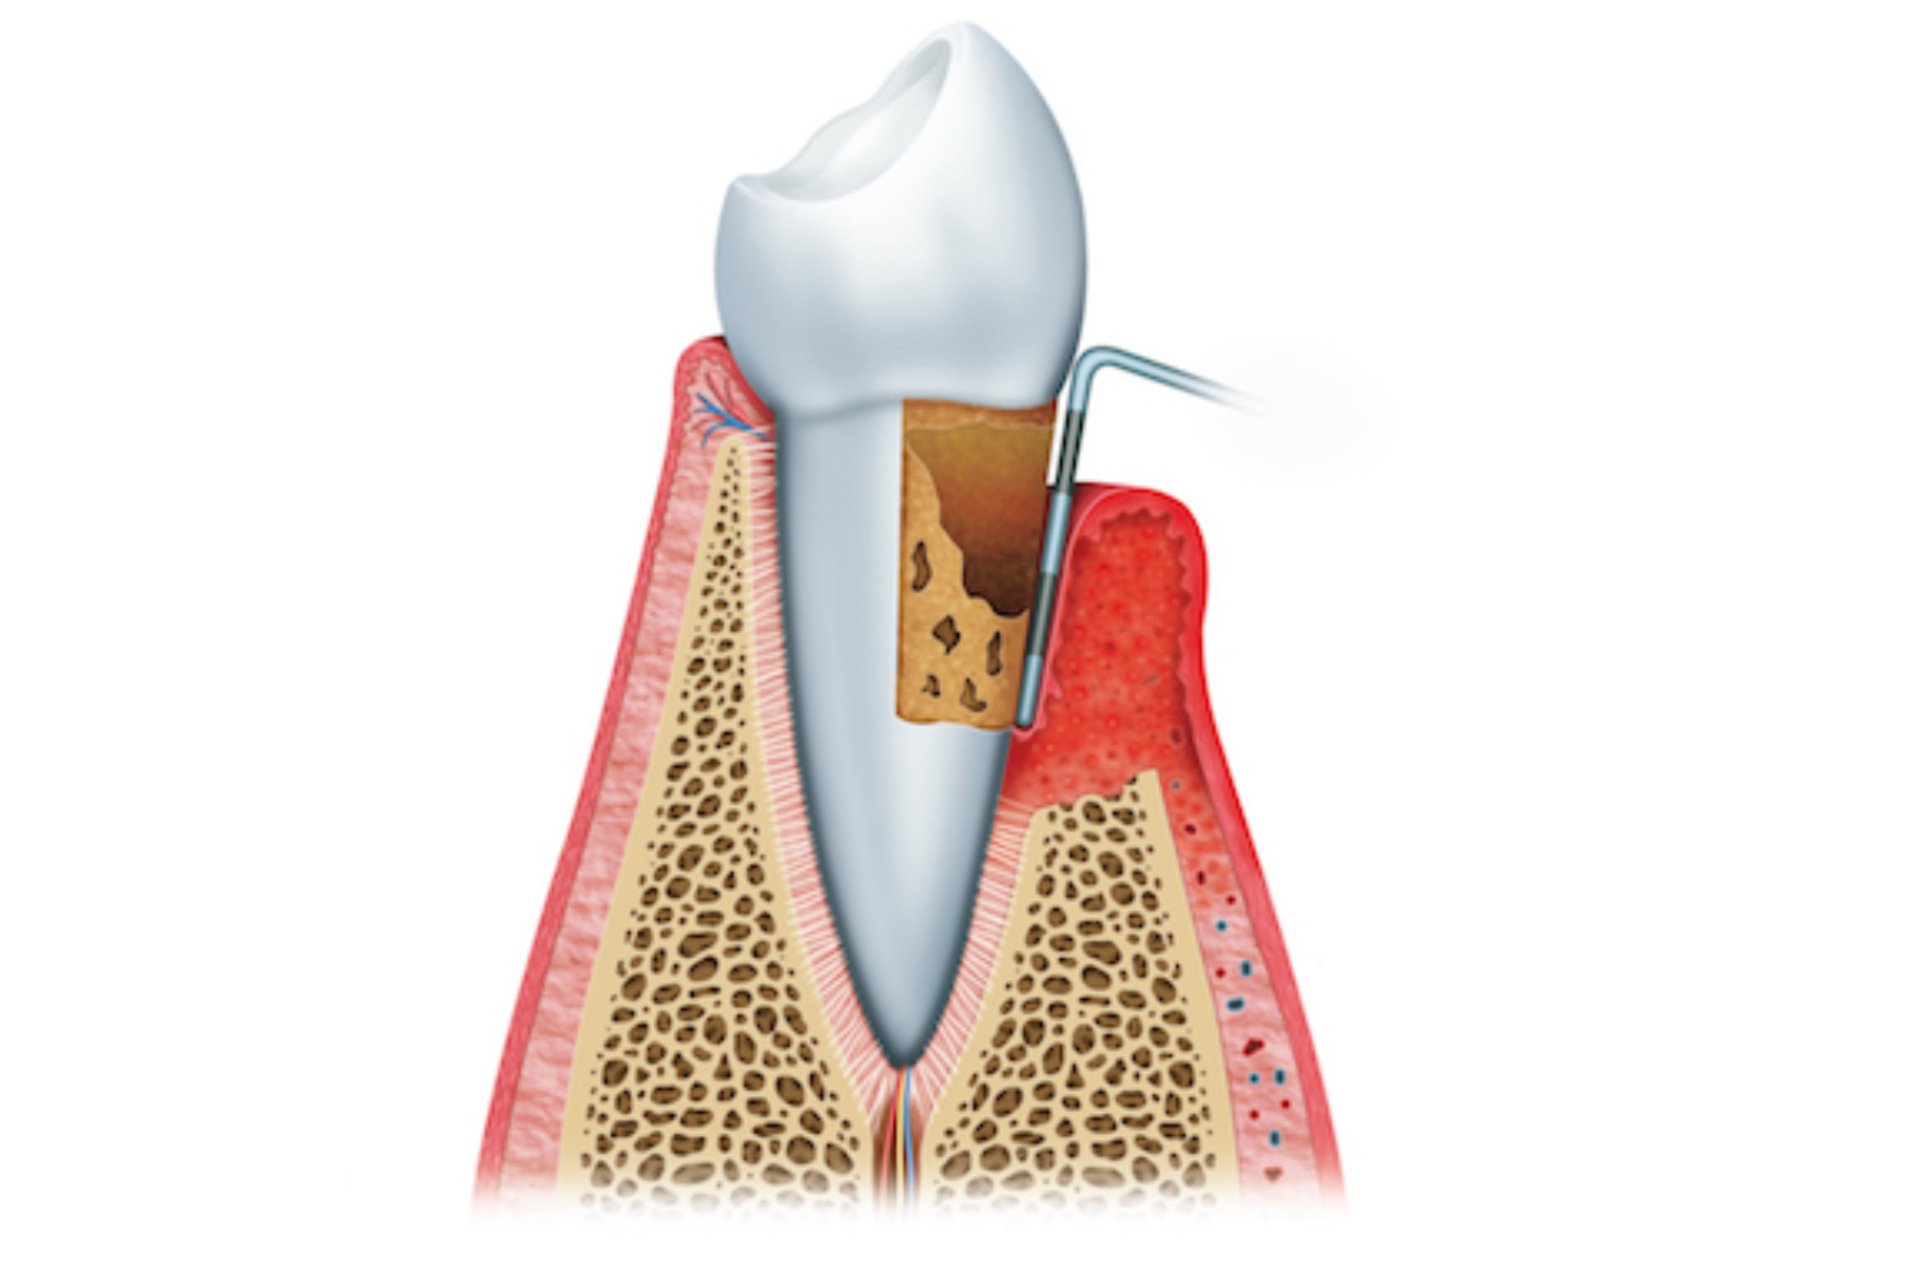 Periodontal pocket treatment